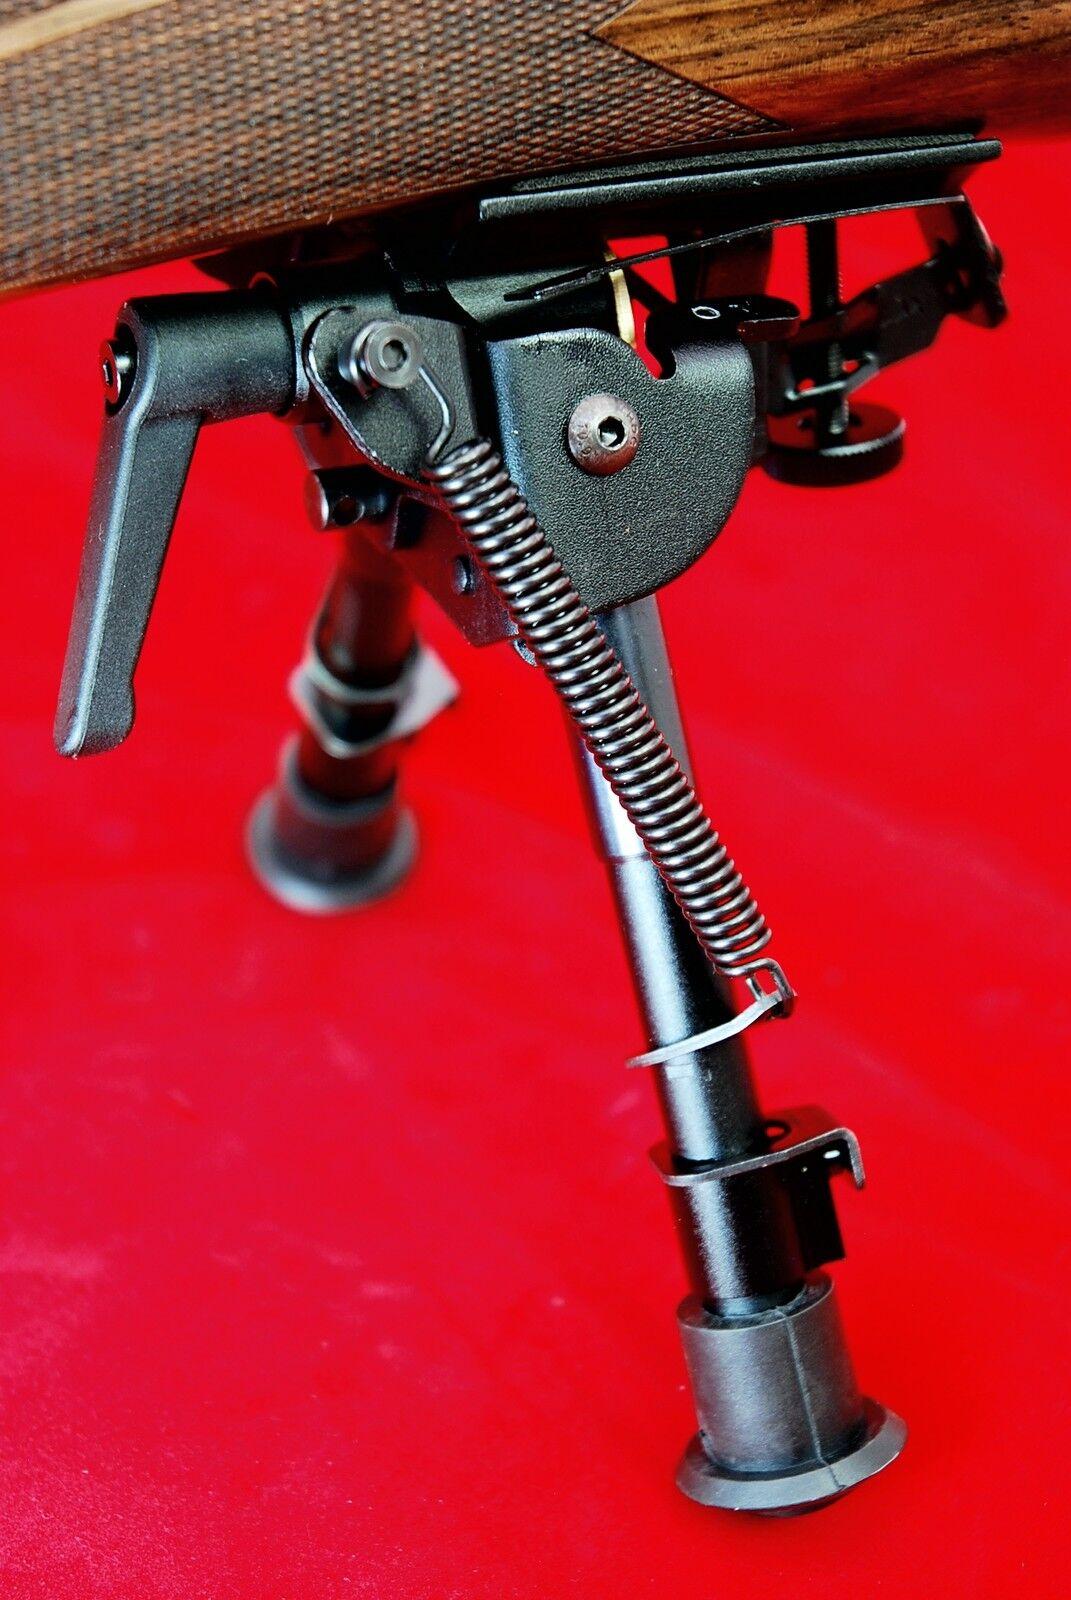 Snipersystems Mk IX 6-9  Inclinable bípode, podlock, rifle DISPARO, pierna Muesca